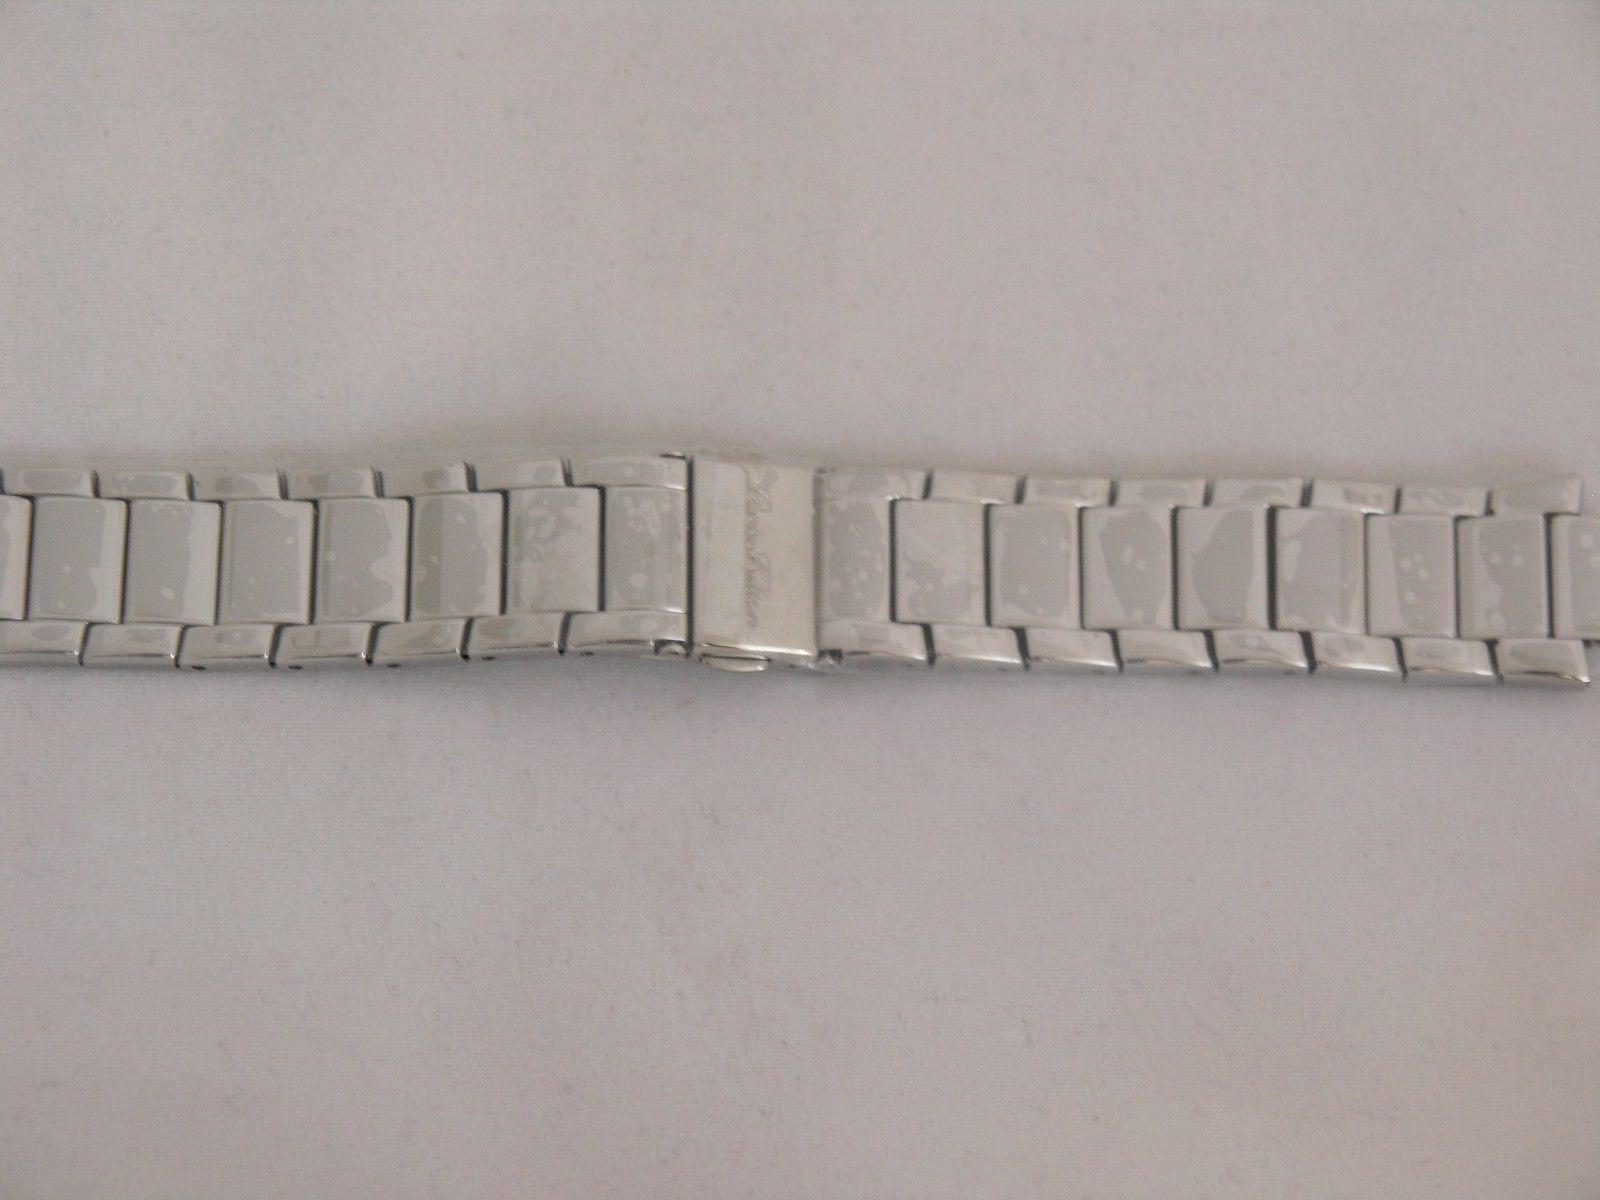 Paris Hilton bracelet Stainless Steel bracelet 13103MS 20mm